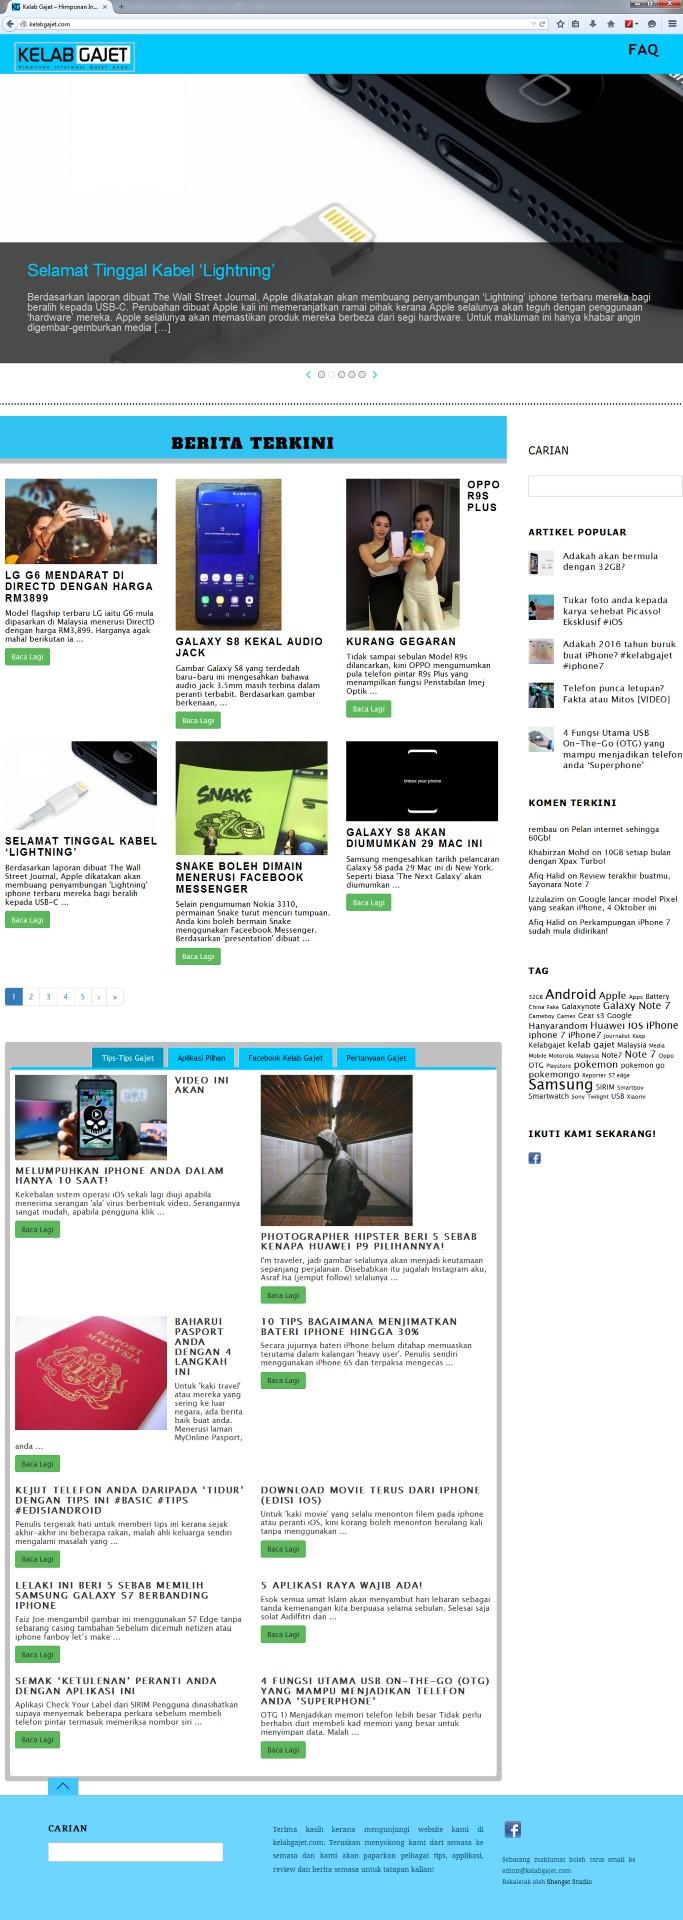 Contoh Design Website Portal Berita Kelabgajet Com Blog Slumb3rstory